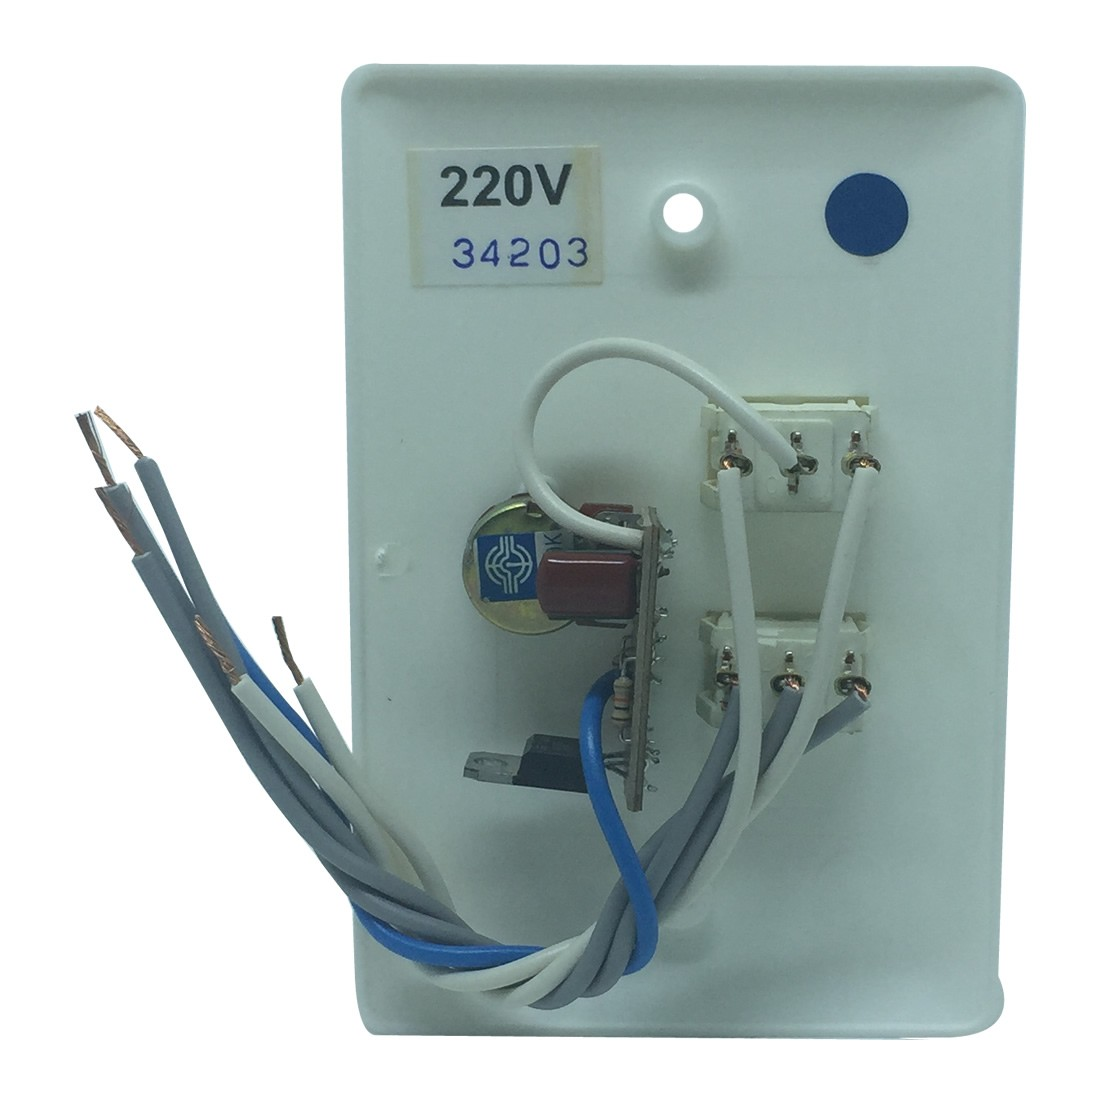 Chave Rotativa Universal Branca para Ventilador de Teto | Novoar